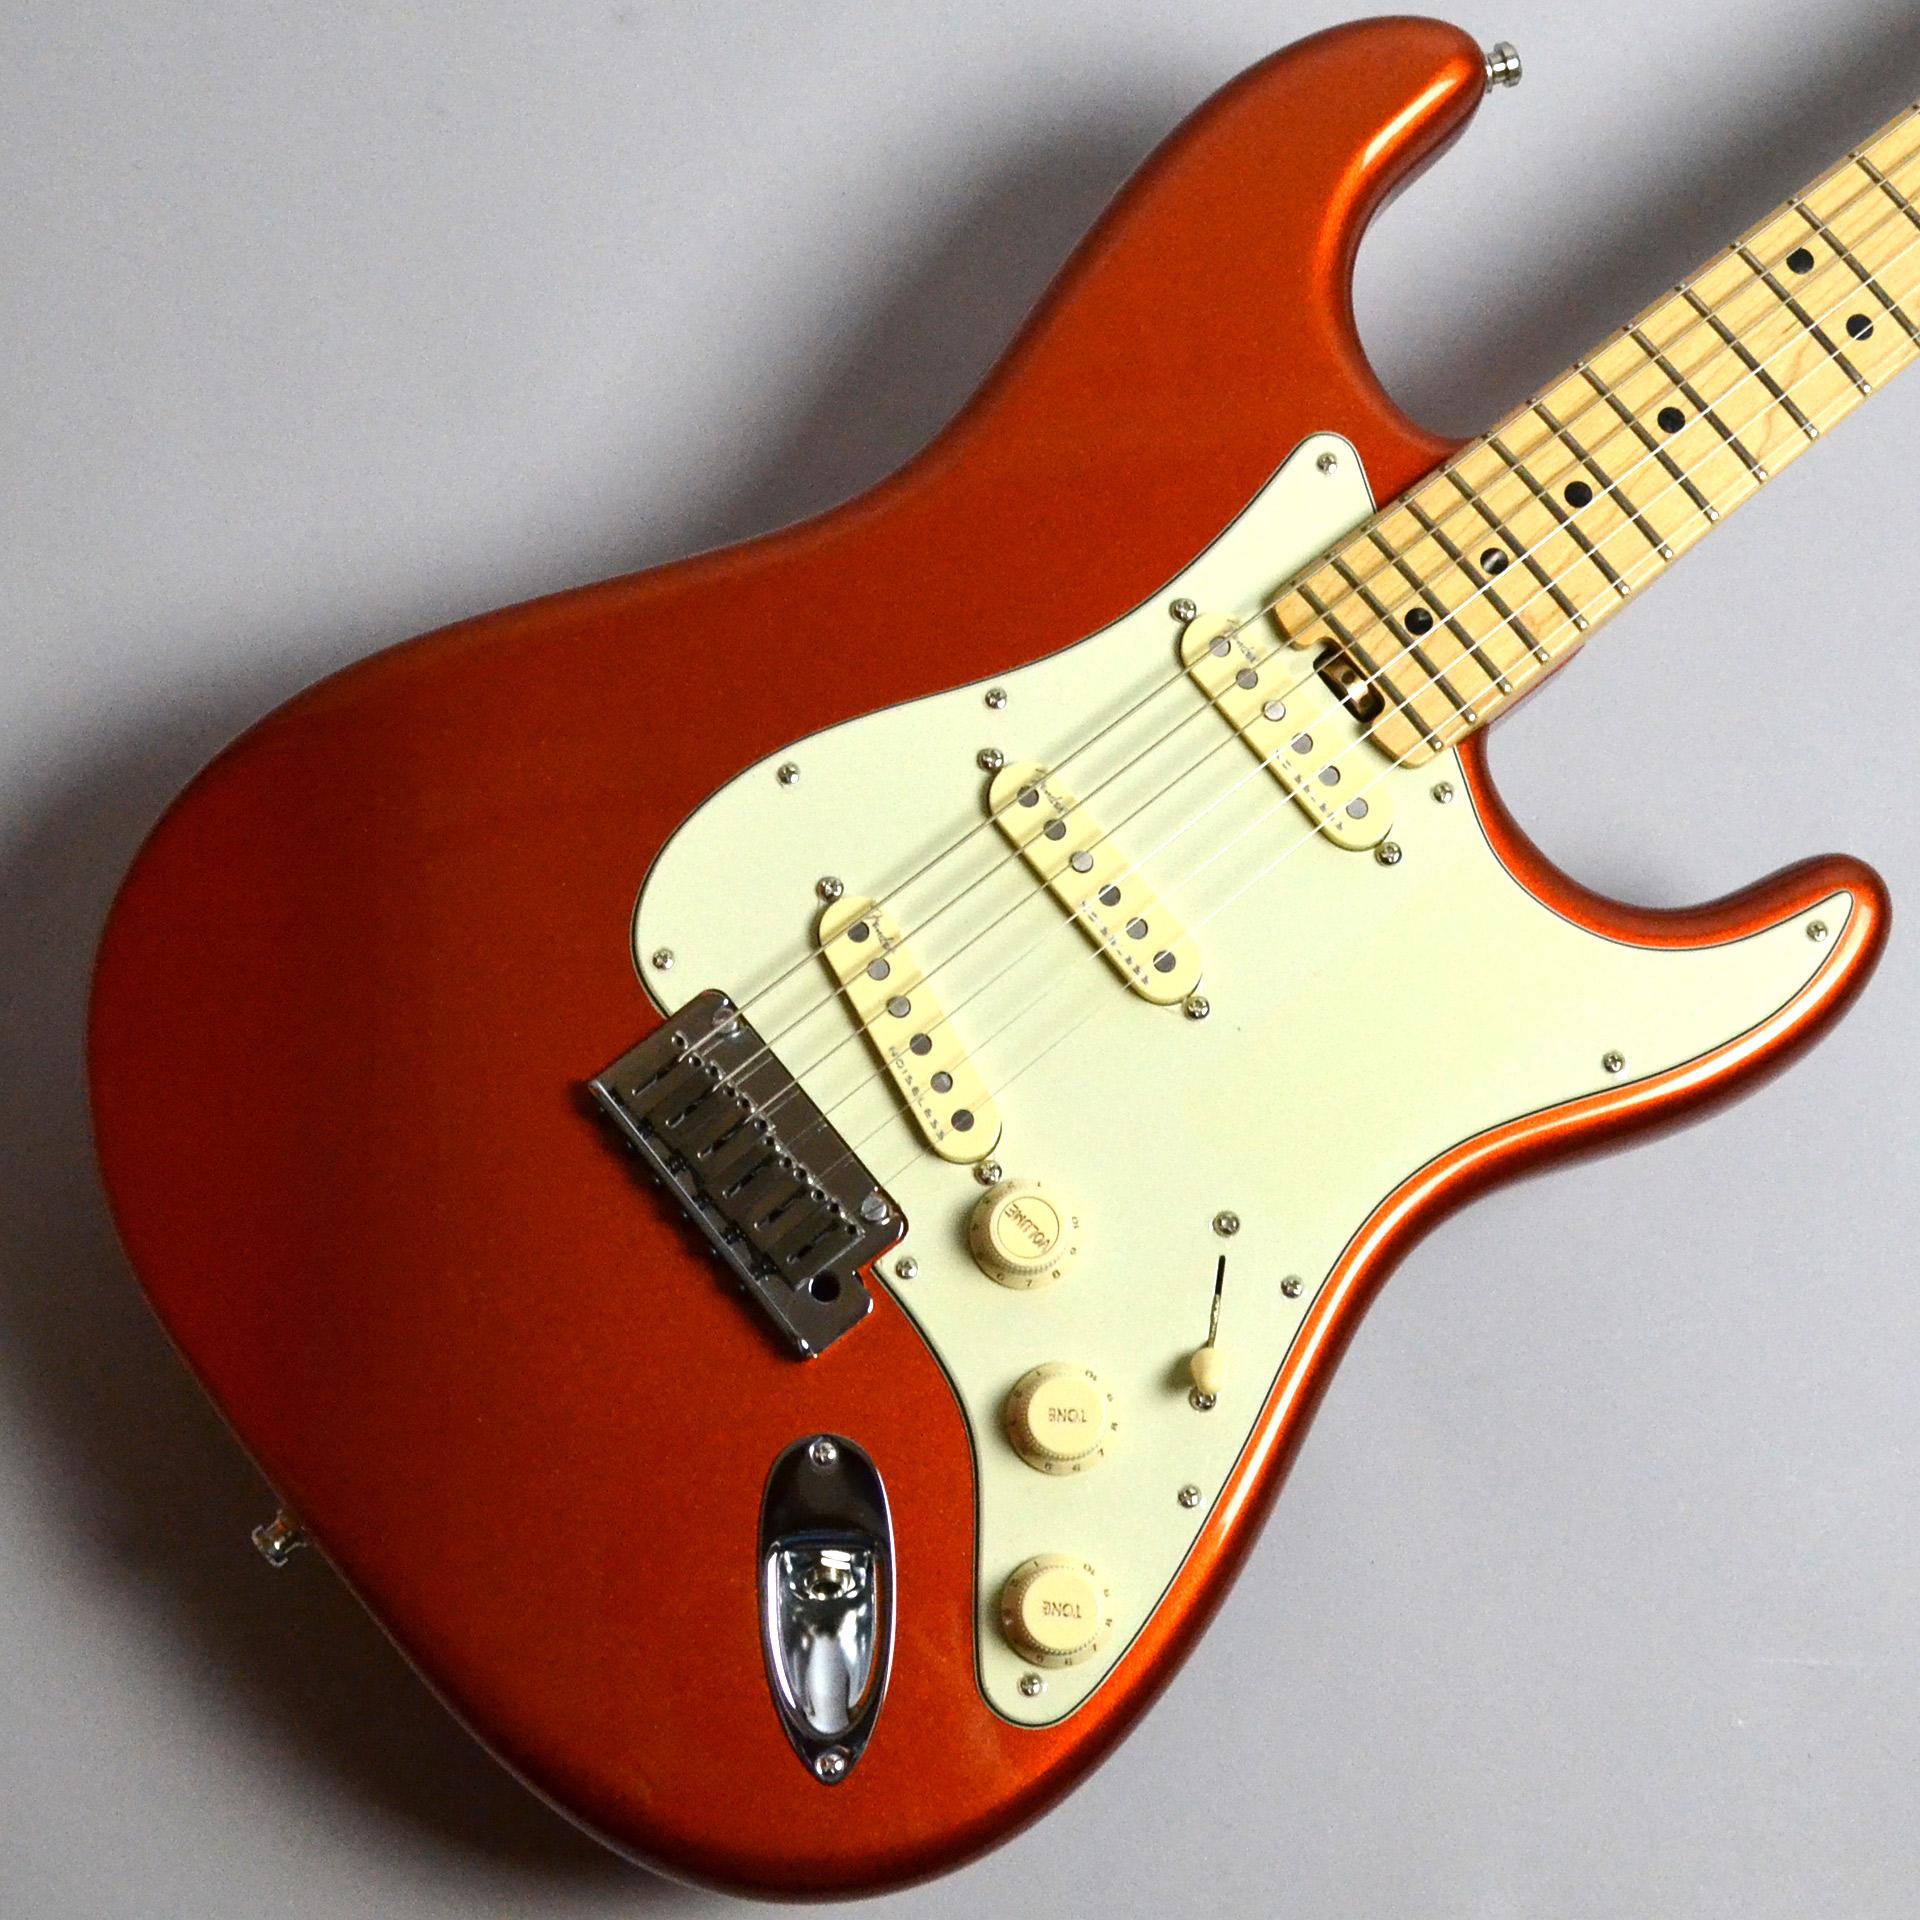 American Elite Stratocaster Maple Fretboard Autumn Blaze Metallic【USED】のボディトップ-アップ画像